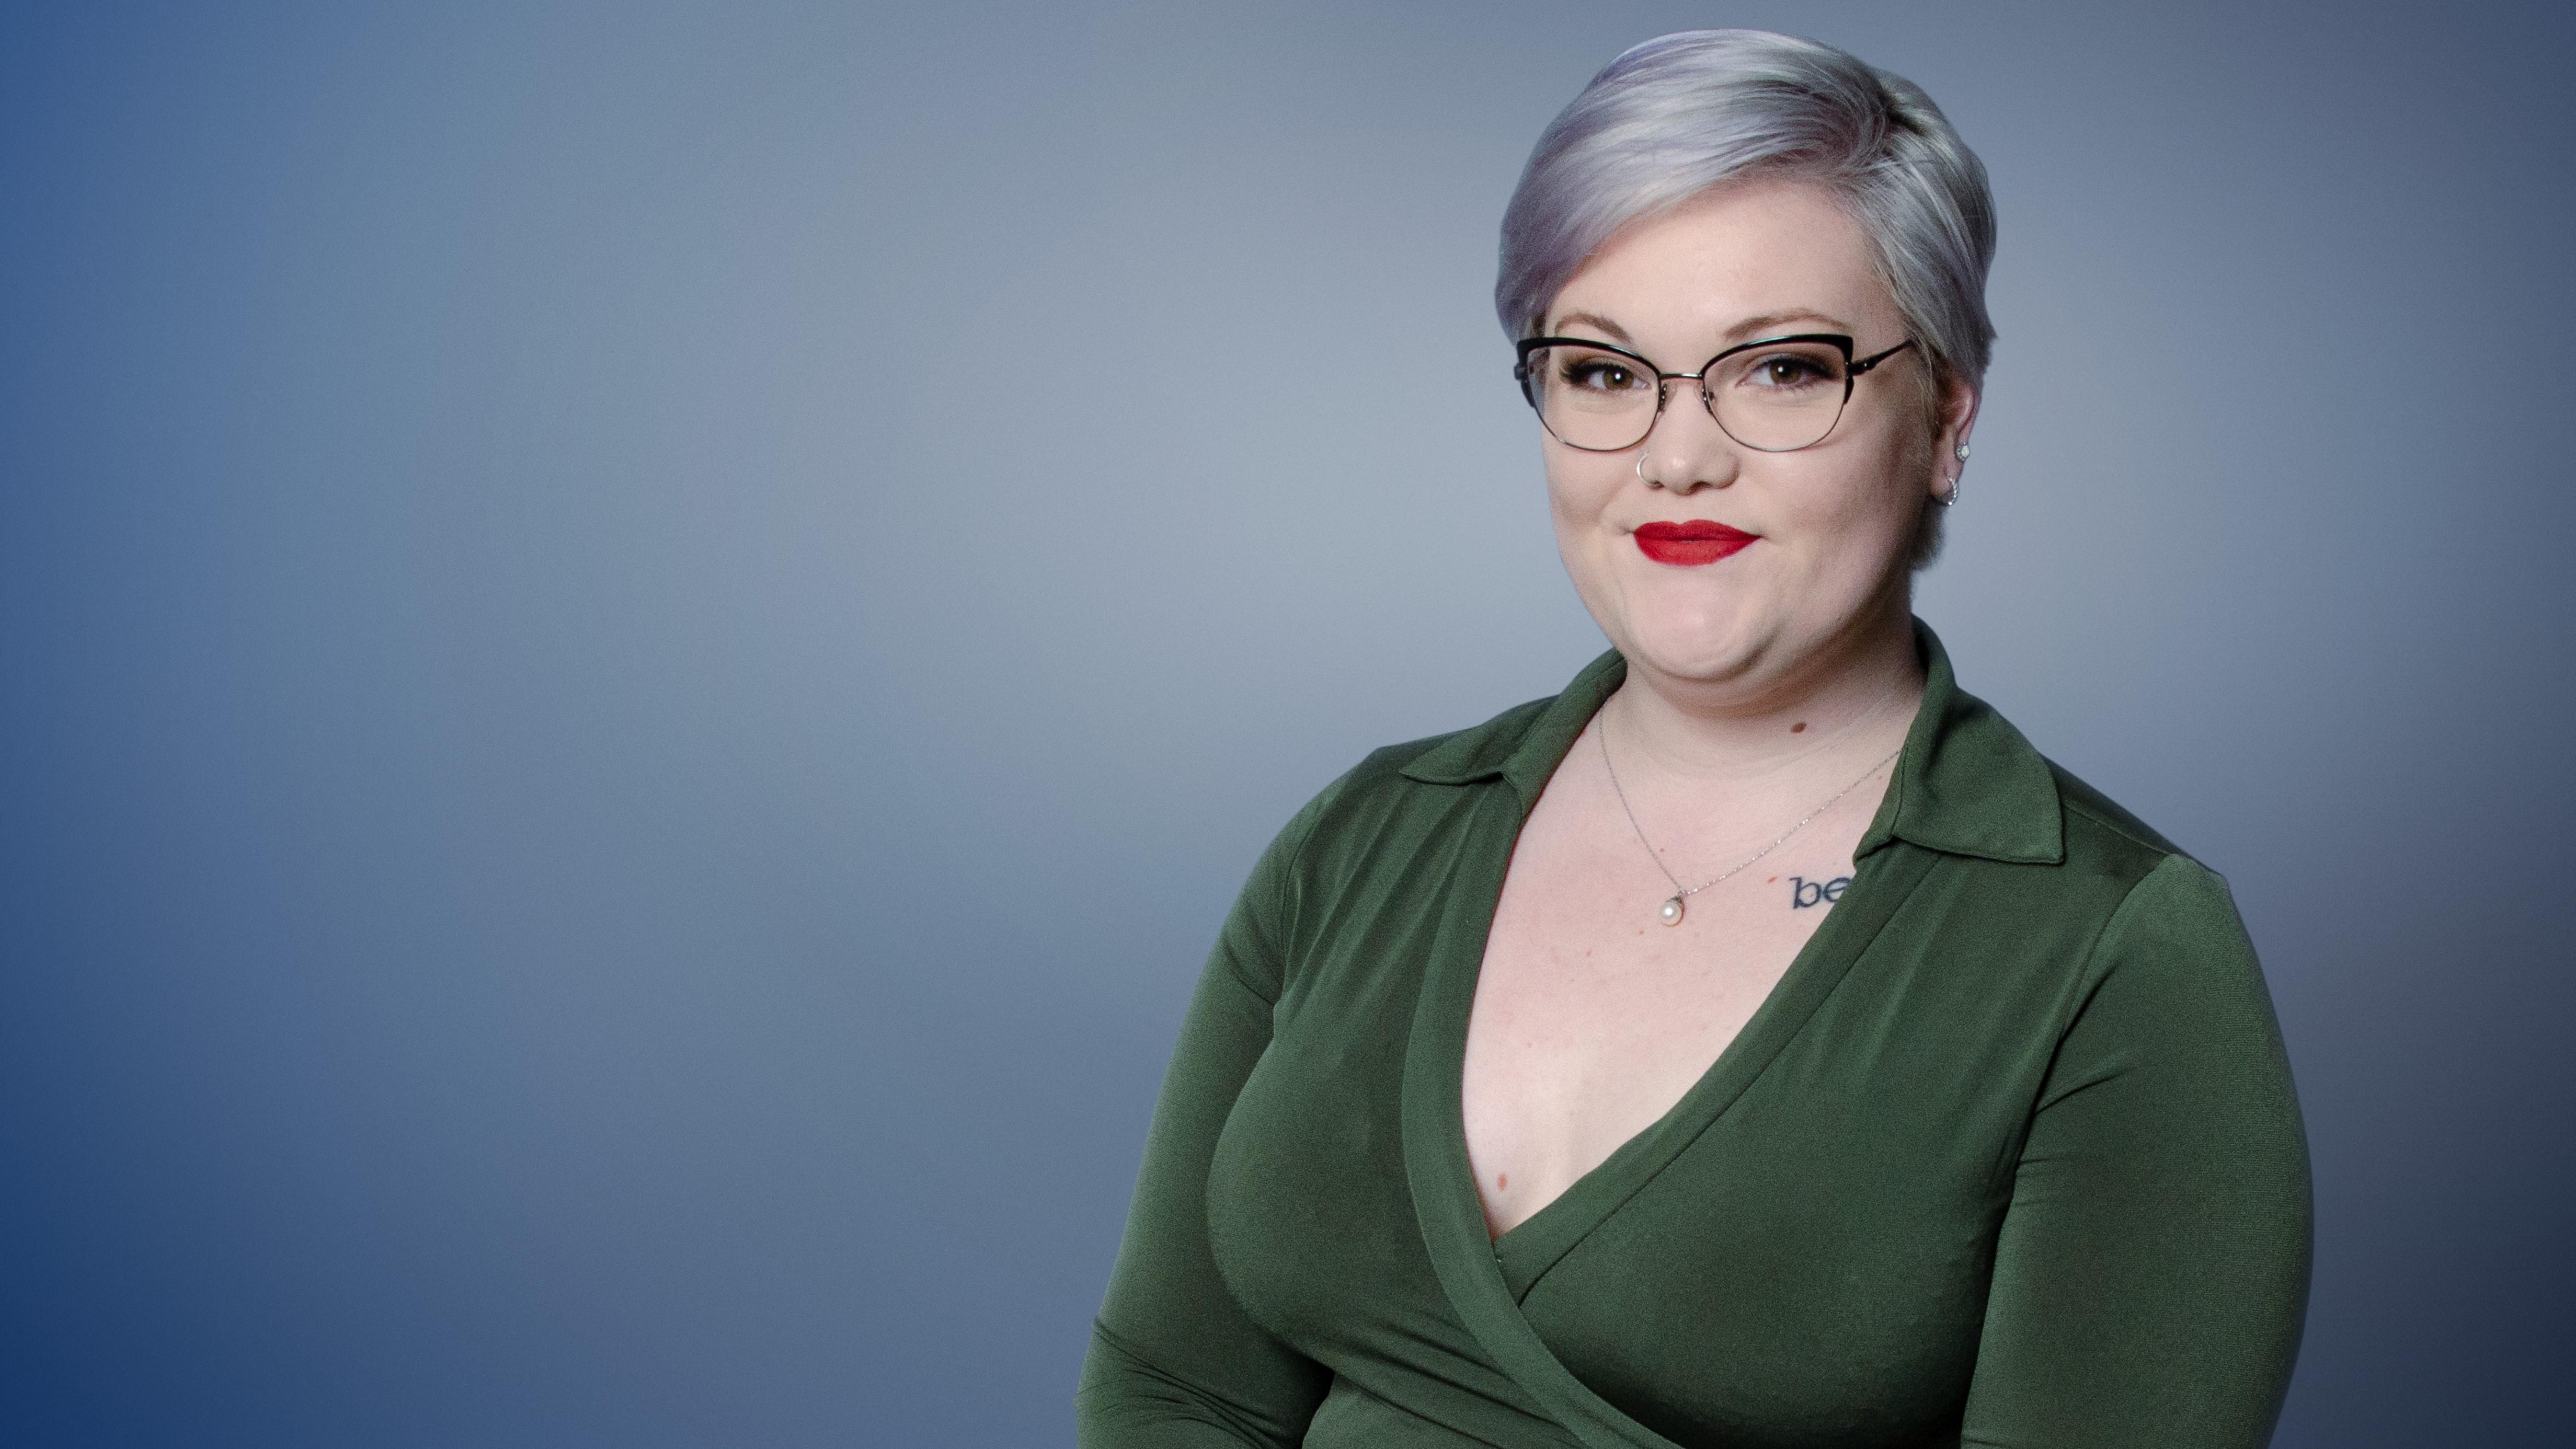 Destiny Johnson, KGW Digital Journalist